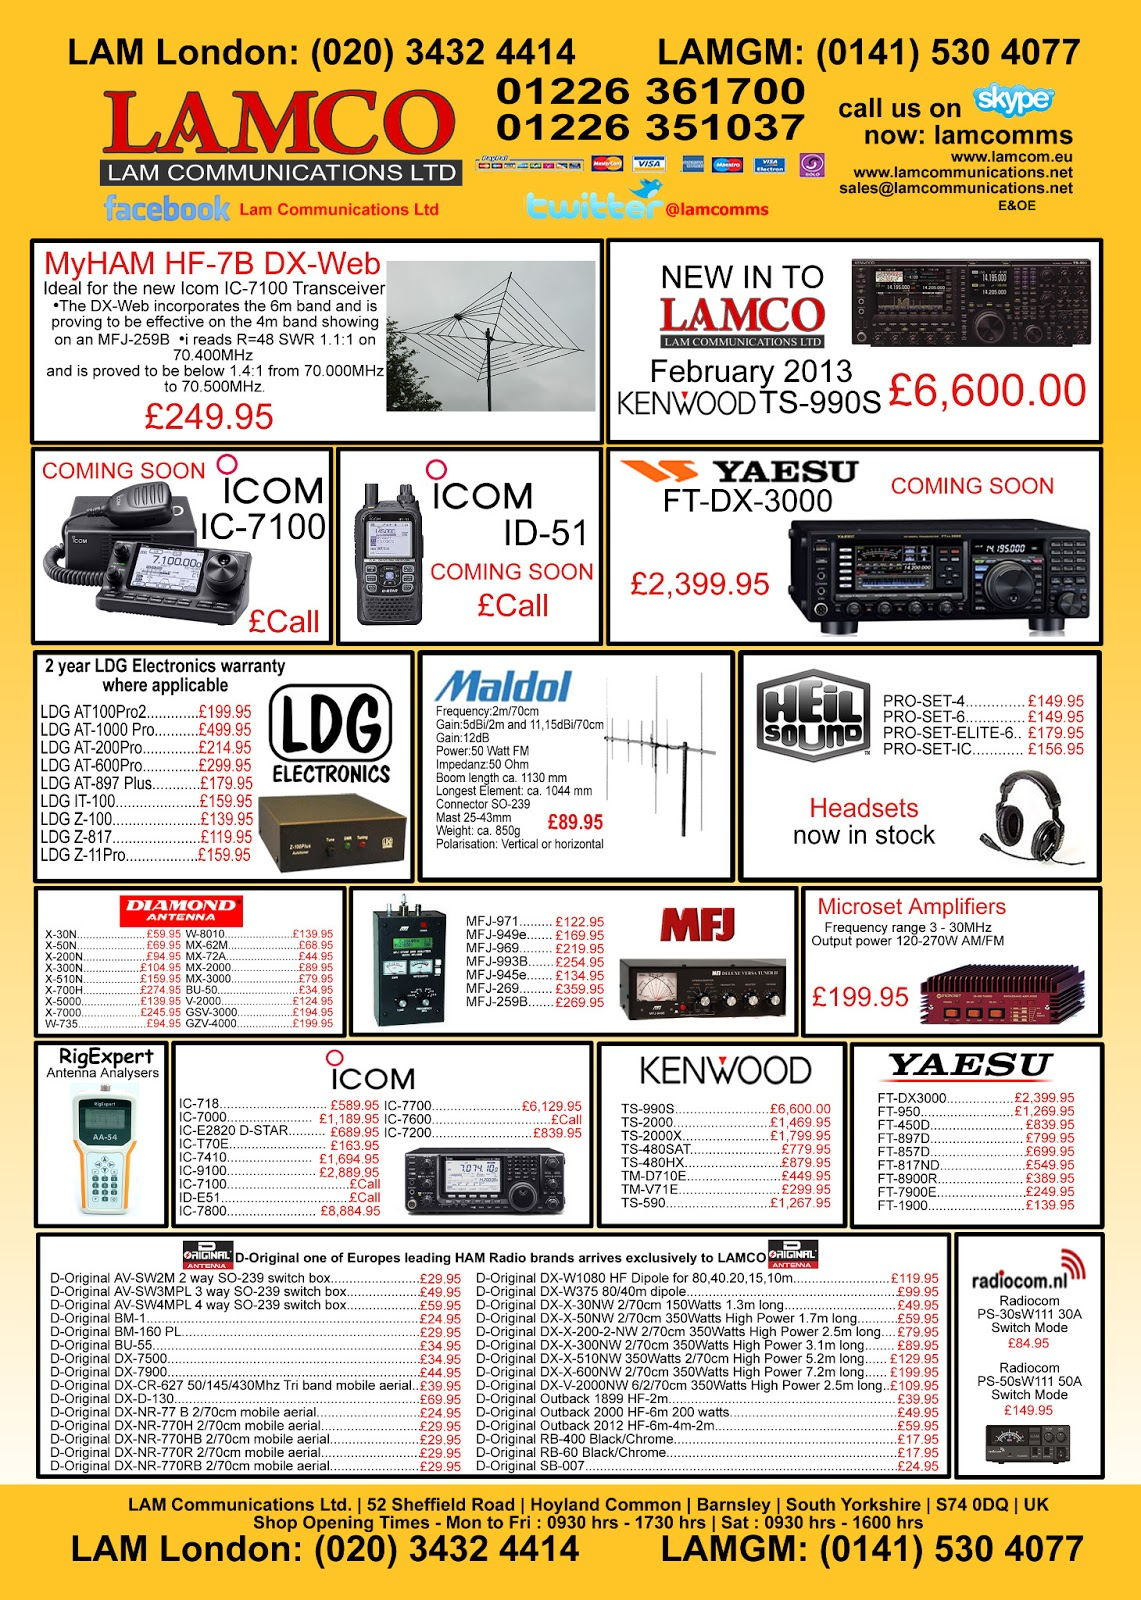 LAMCO Ham Radio News Blog : The new advert for RADCOM and Practical